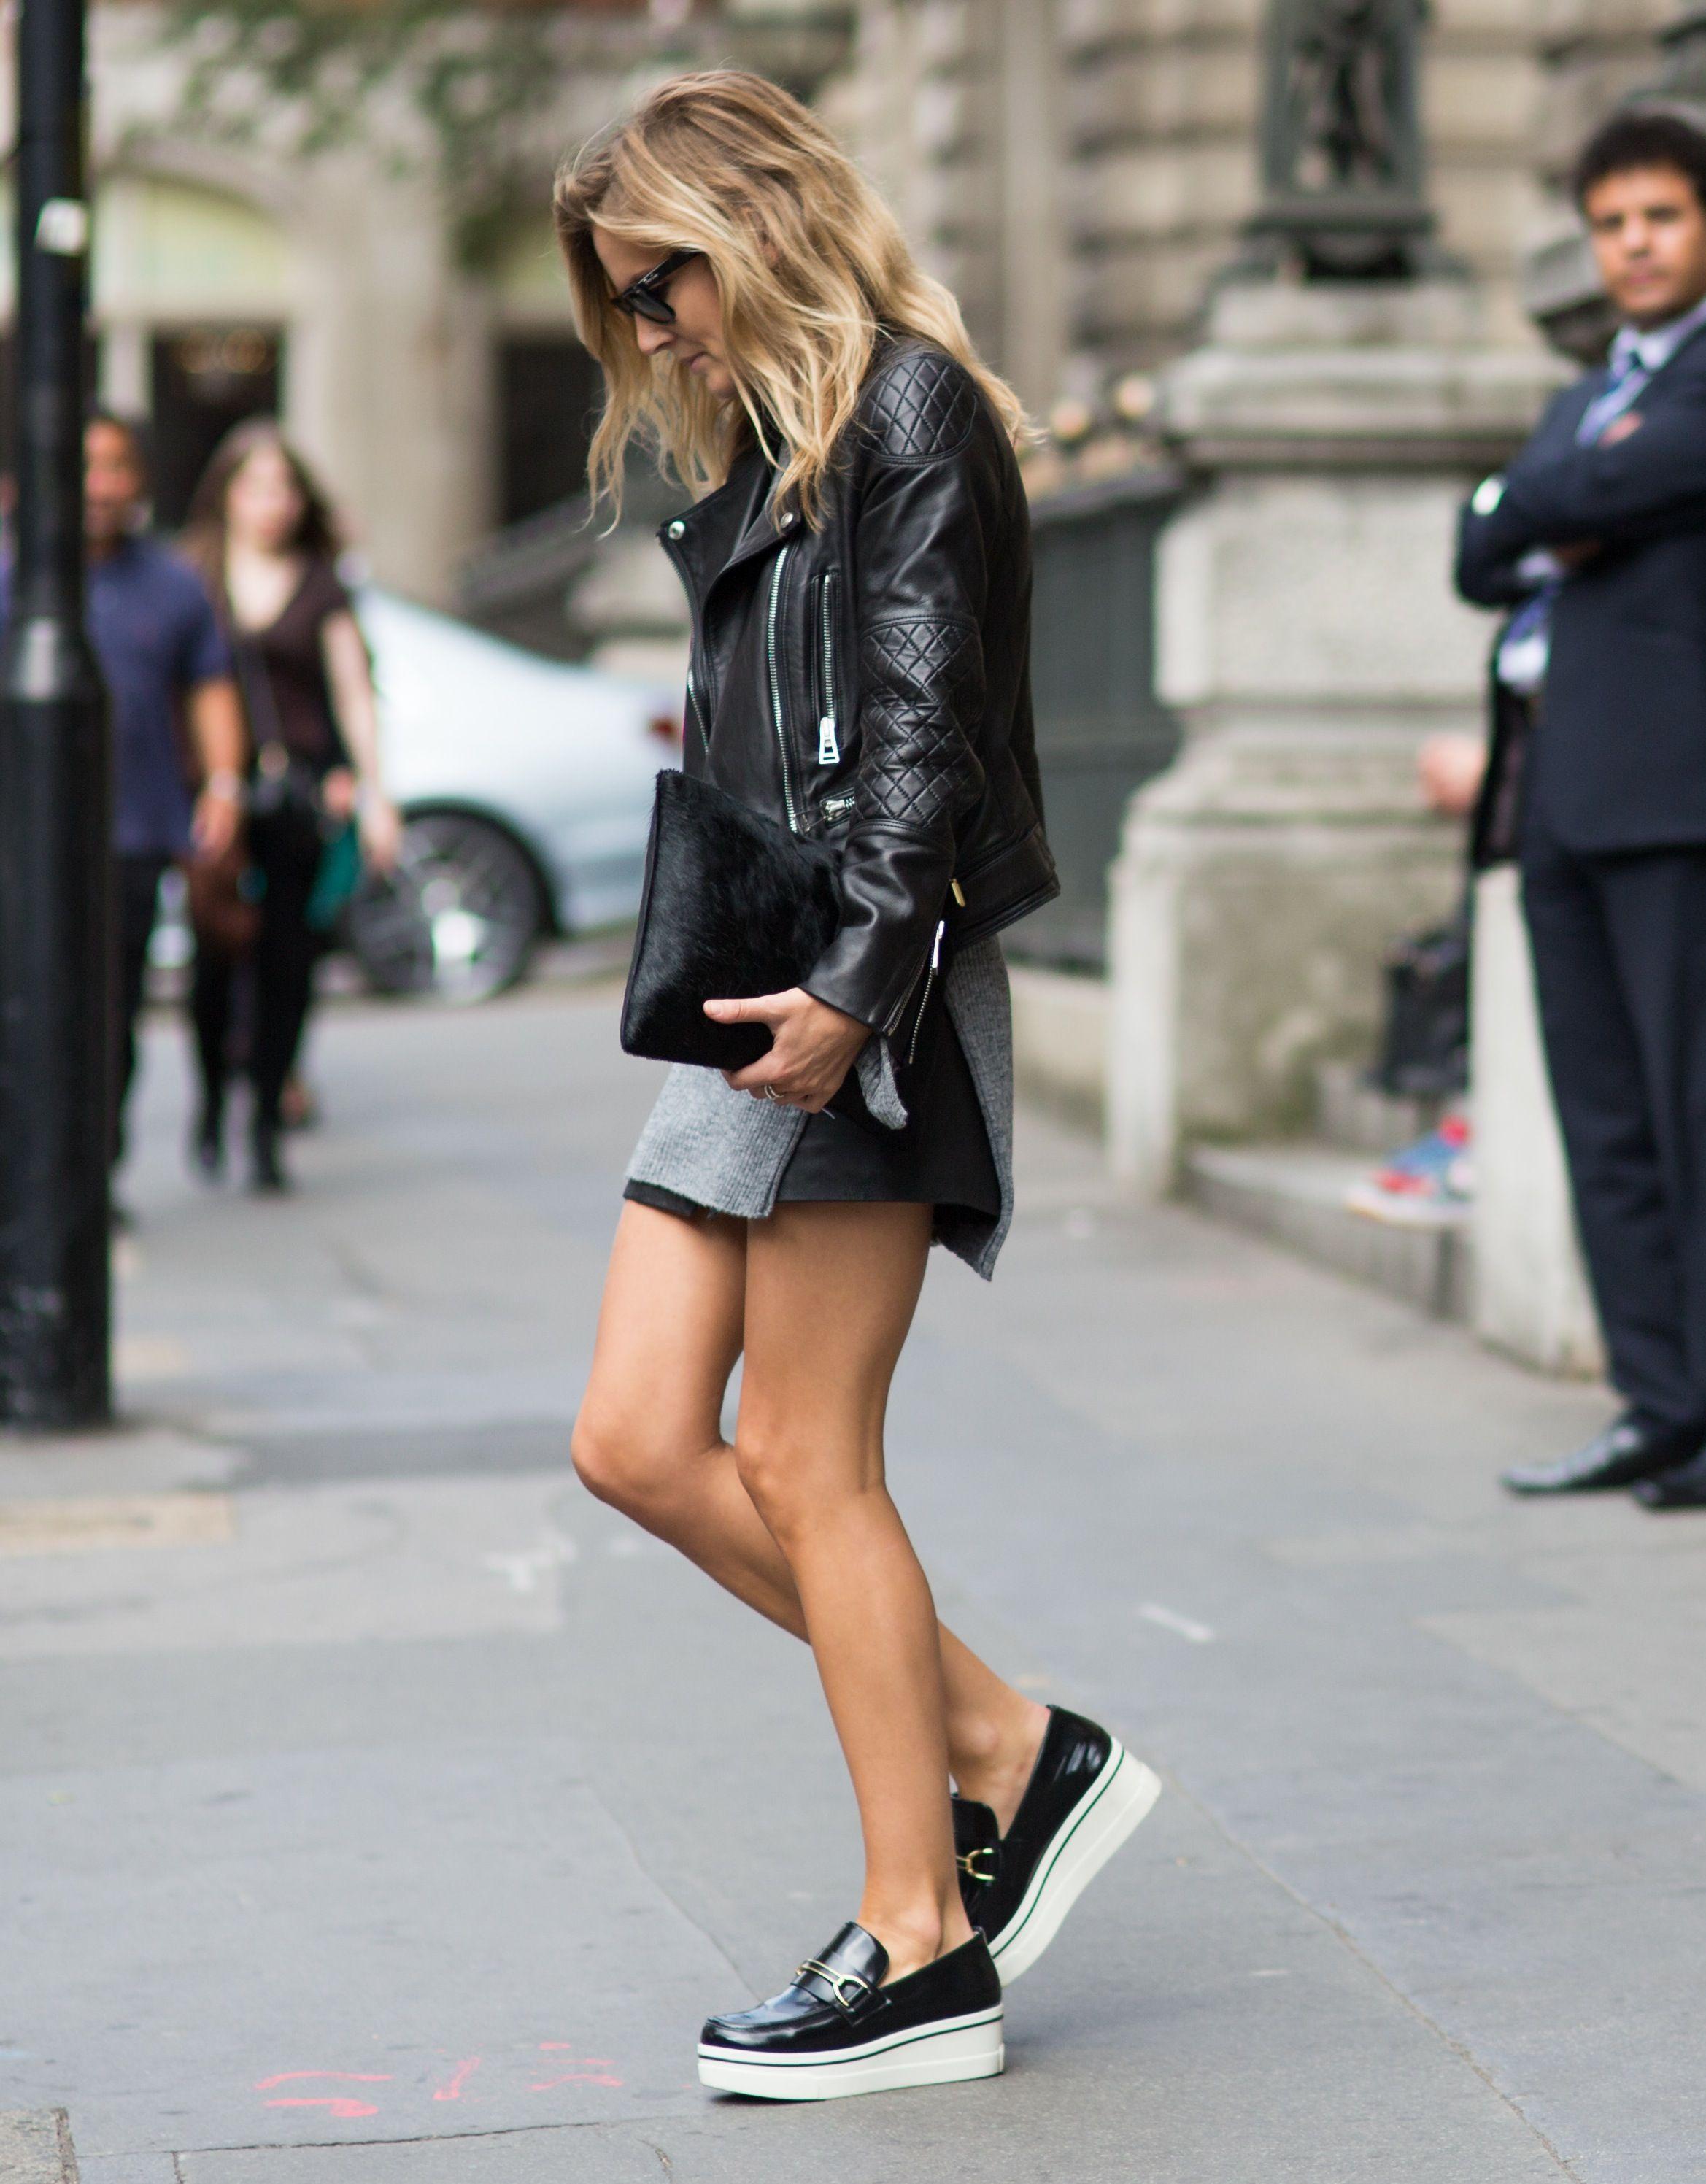 Minimal + Classic | Leather moto jacket | Stella McCartney platform shoes | Street Style.